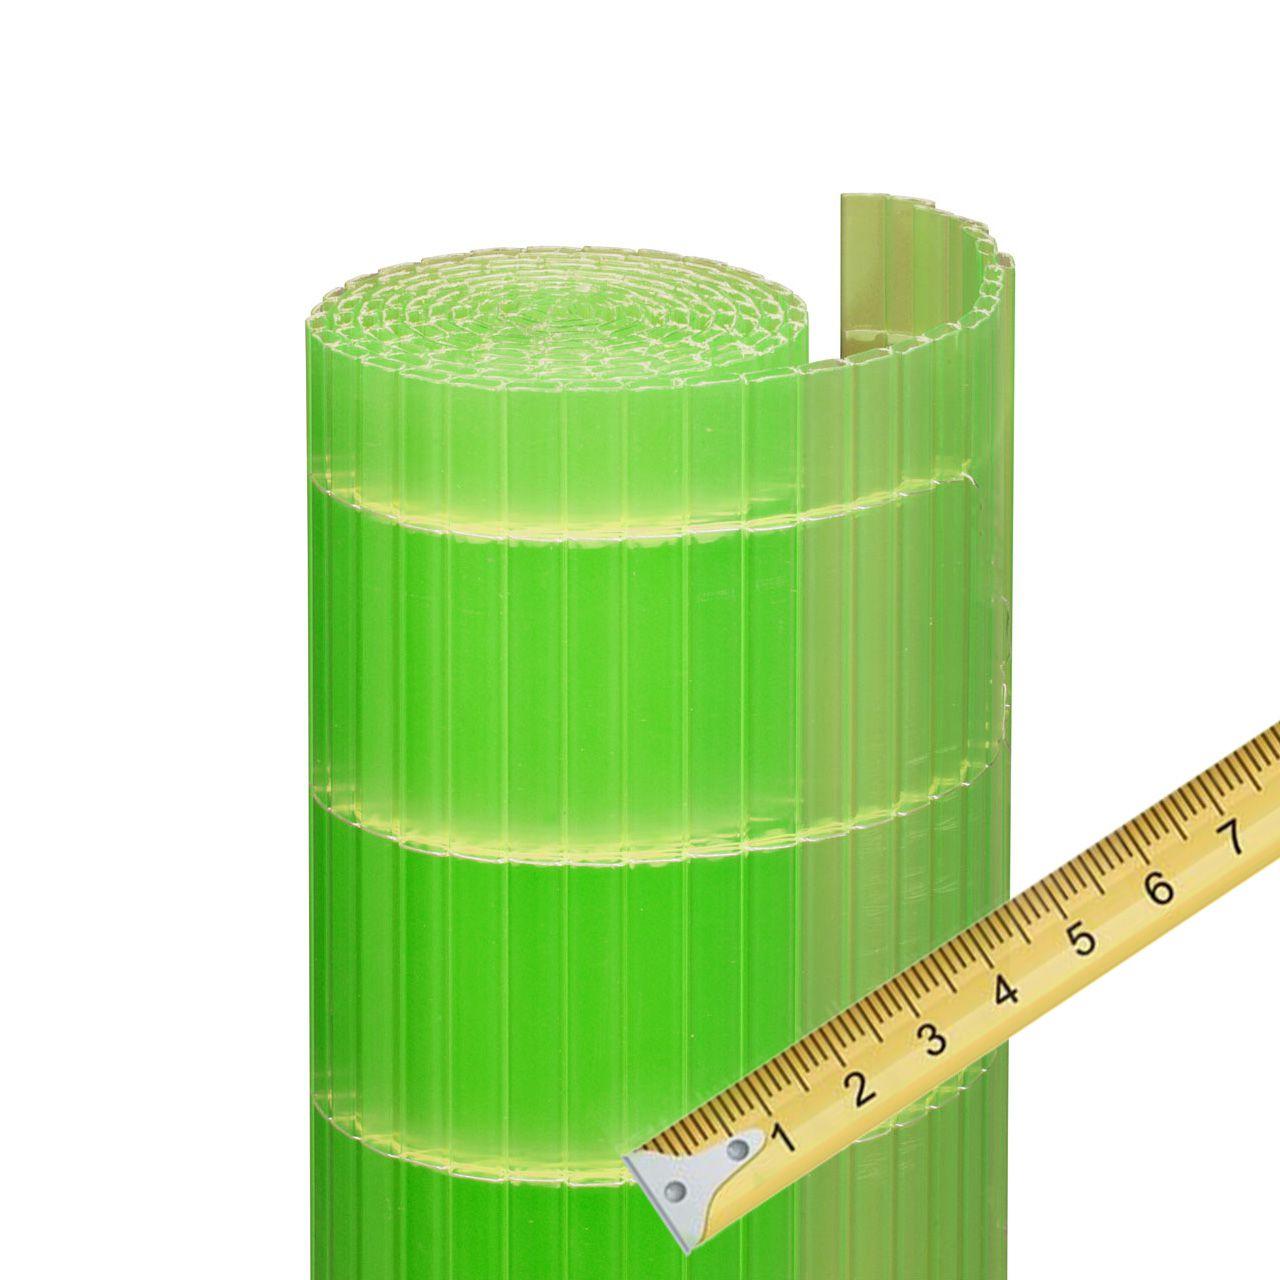 Sichtschutzmatte PVC Kunststoff Meterware Sunline limonengrün